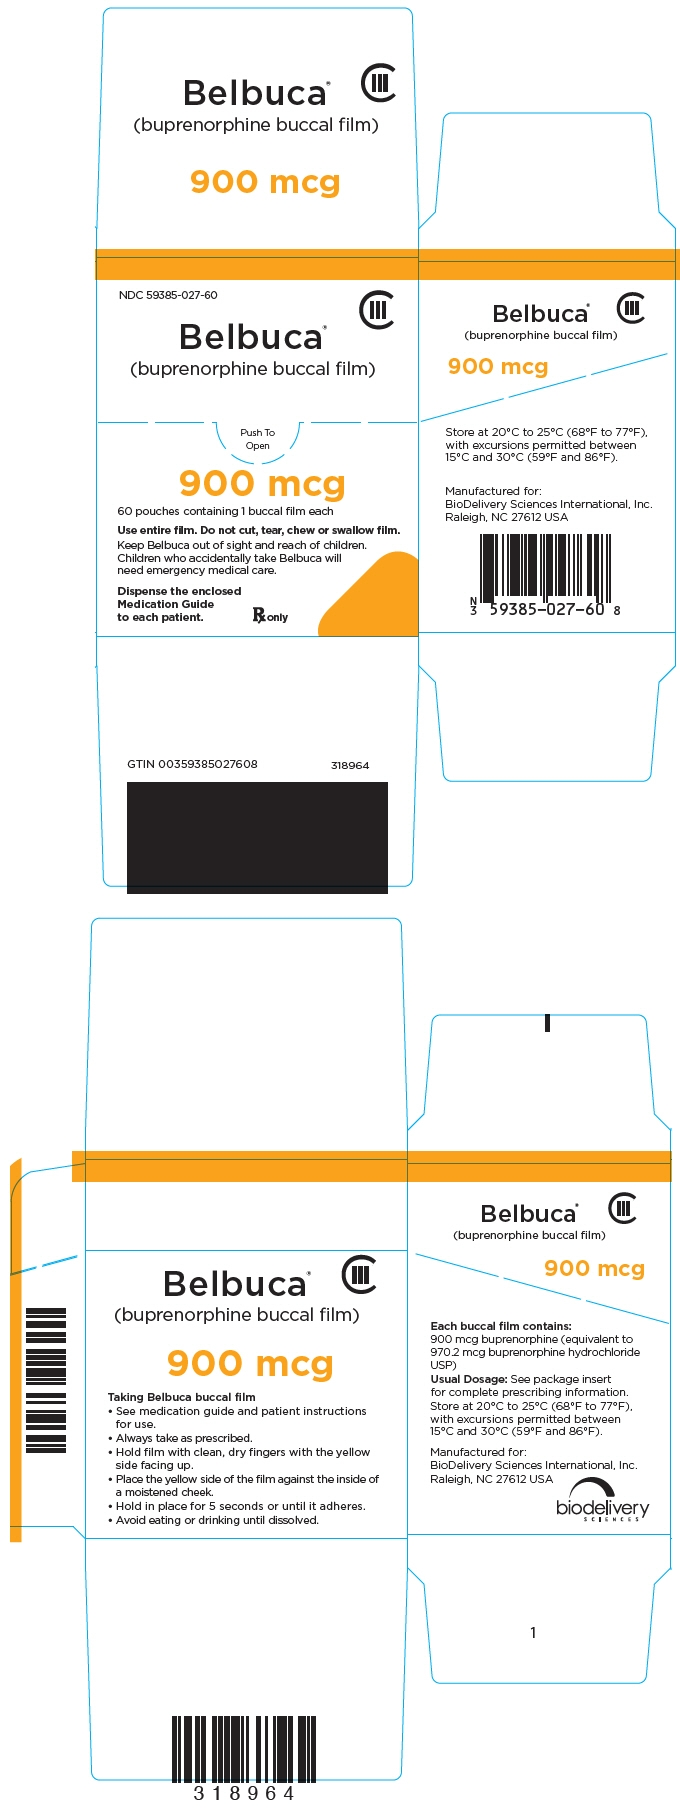 Principal Display Panel - 900 mcg Film Pouch Box